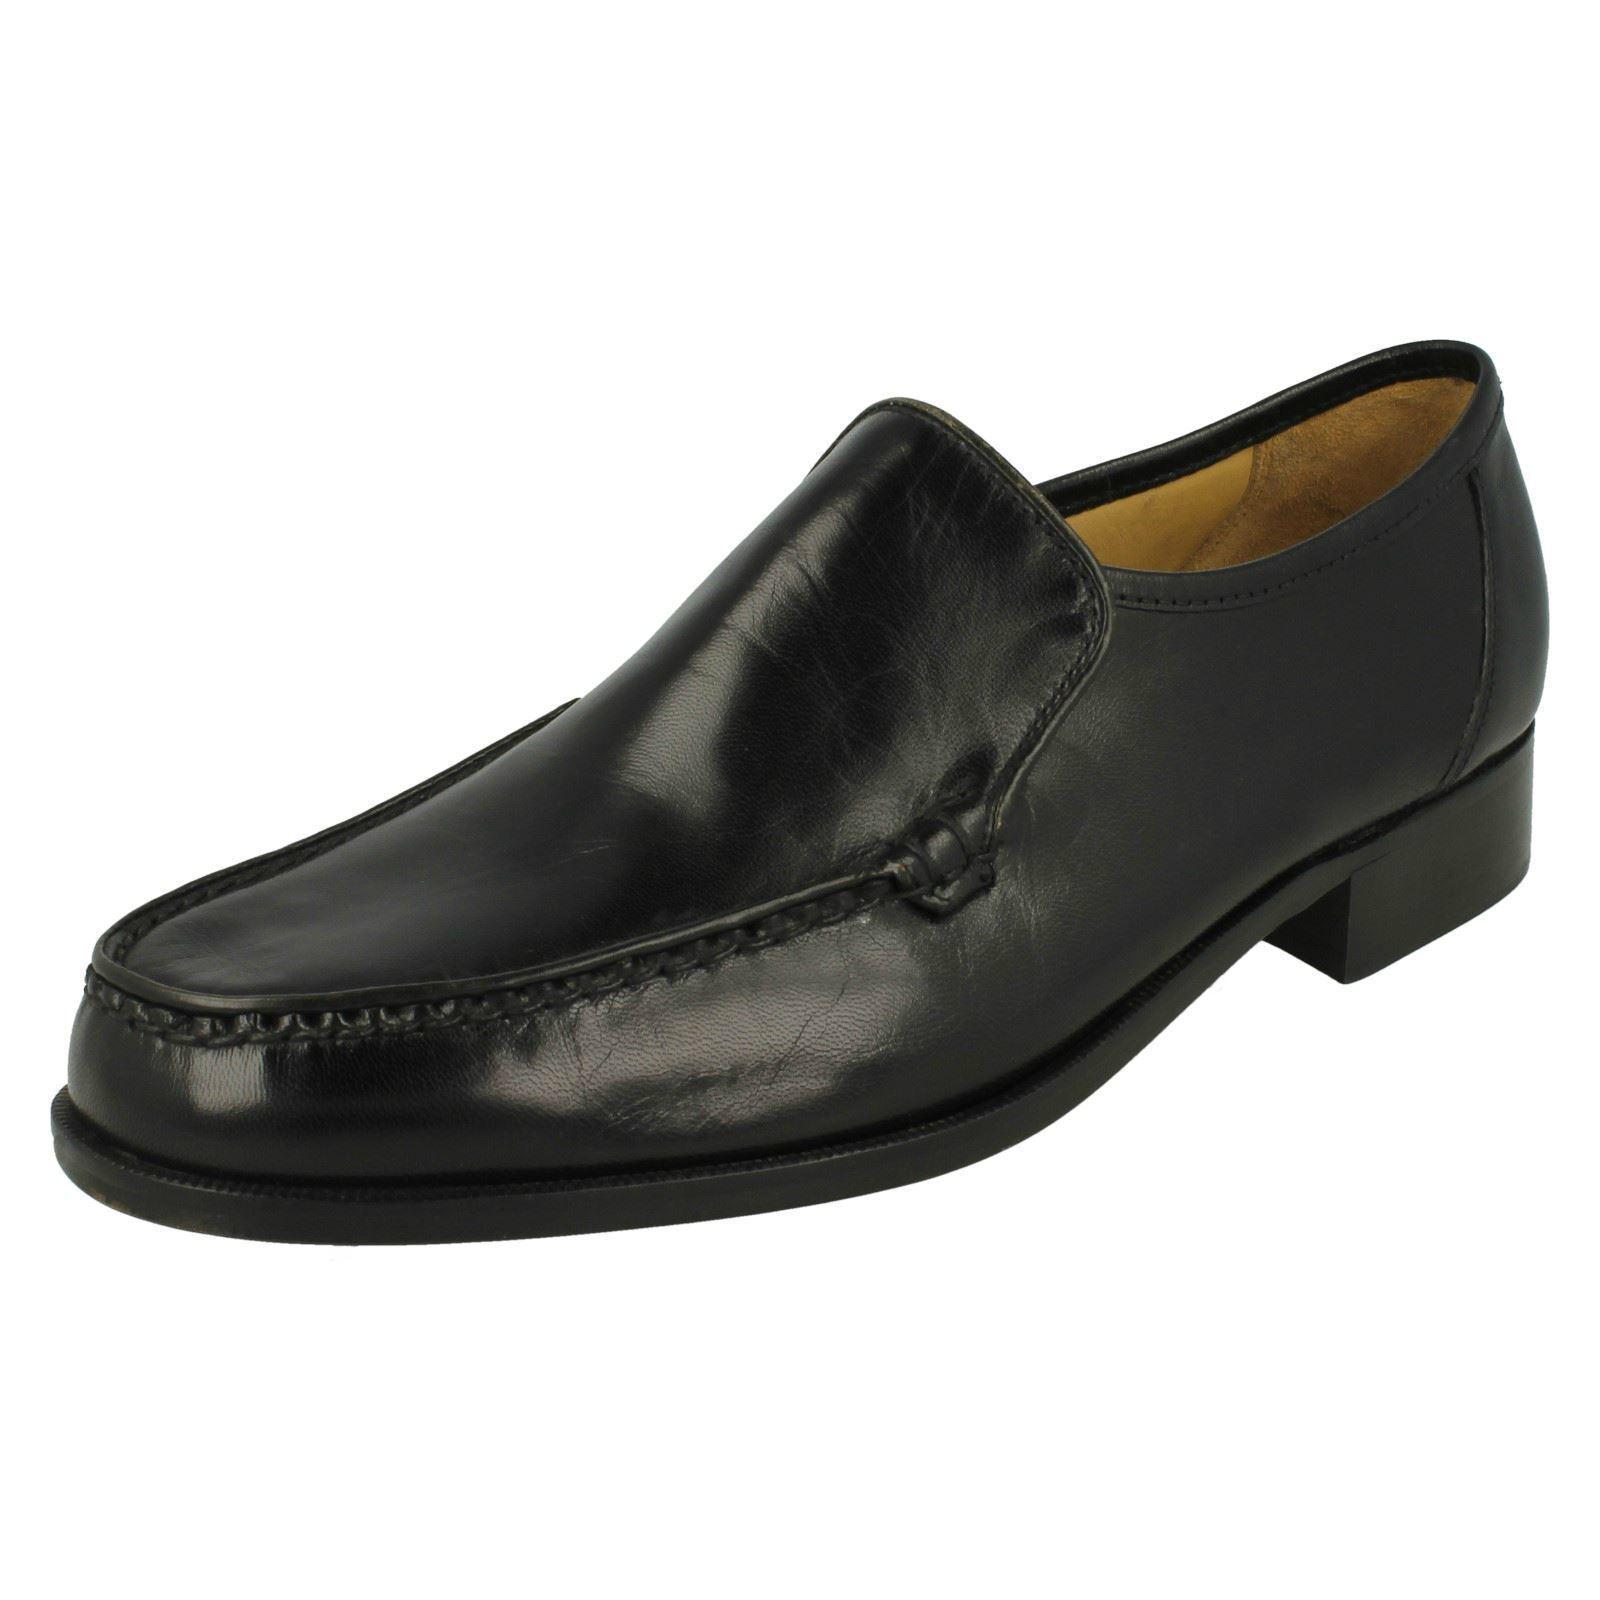 Herren Thomas Blunt schwarzer Slipper Schuhe Illinois